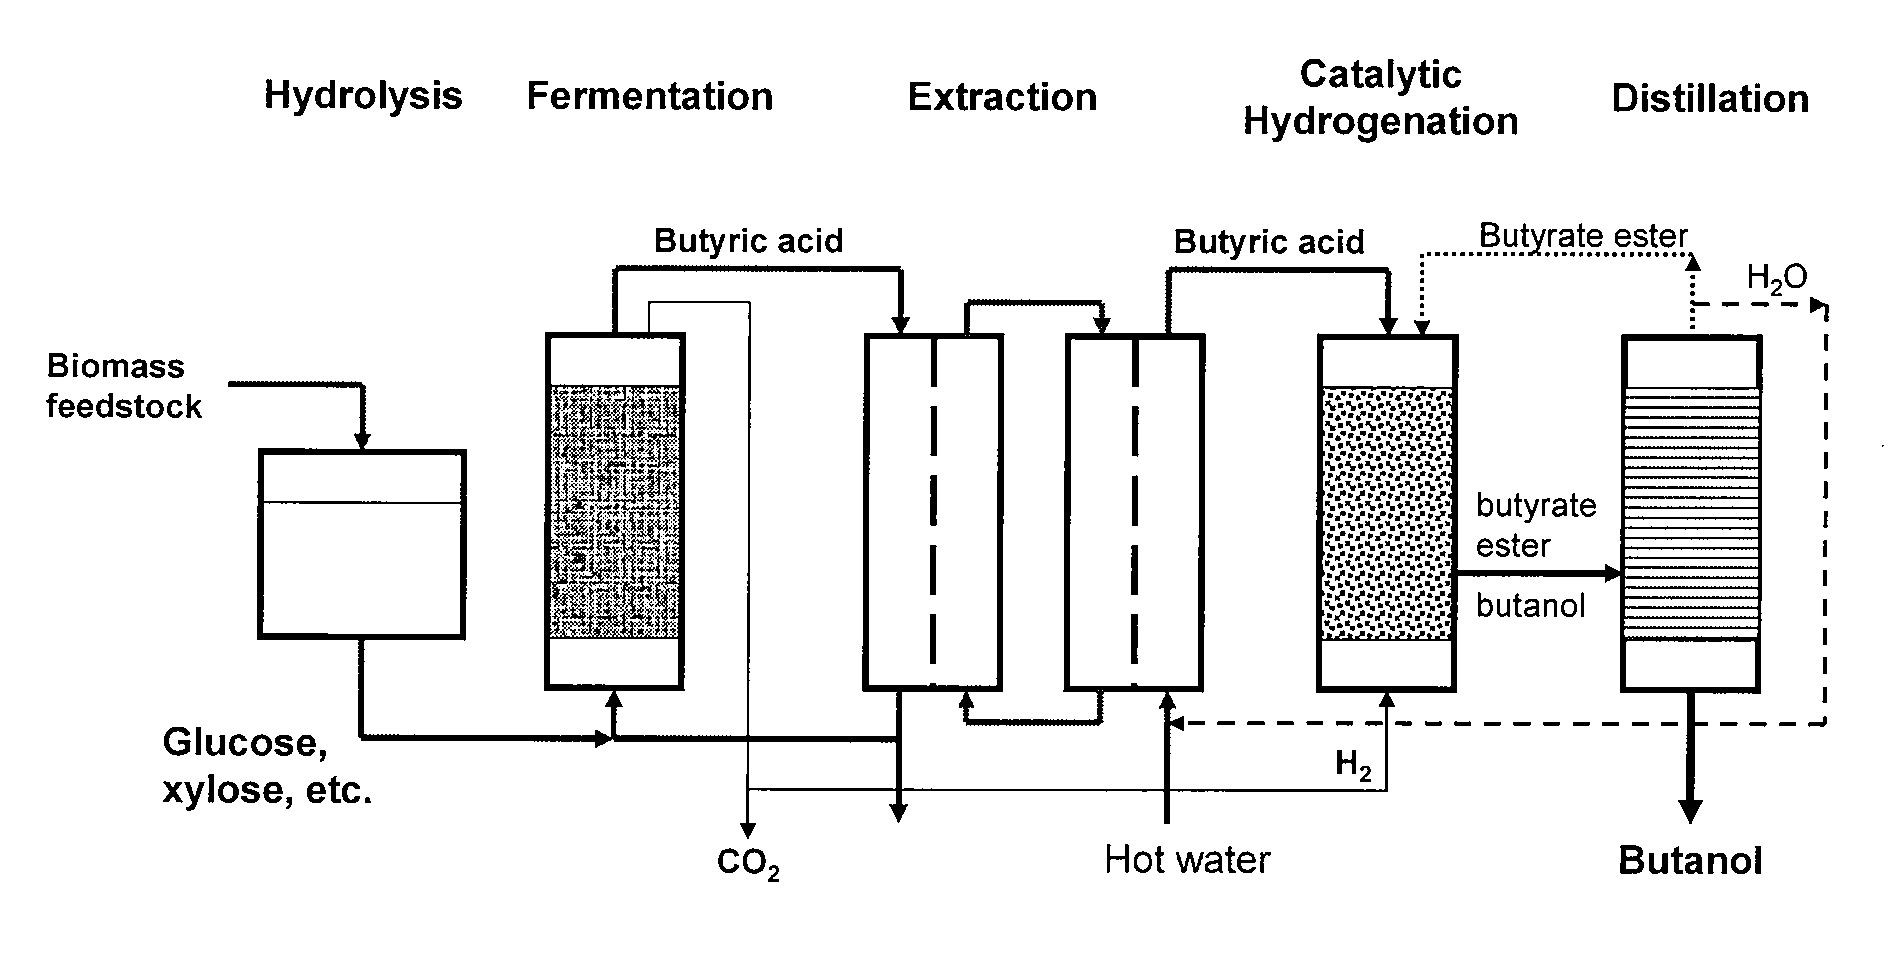 pump school liquid listacetone butanol fermentation revisited